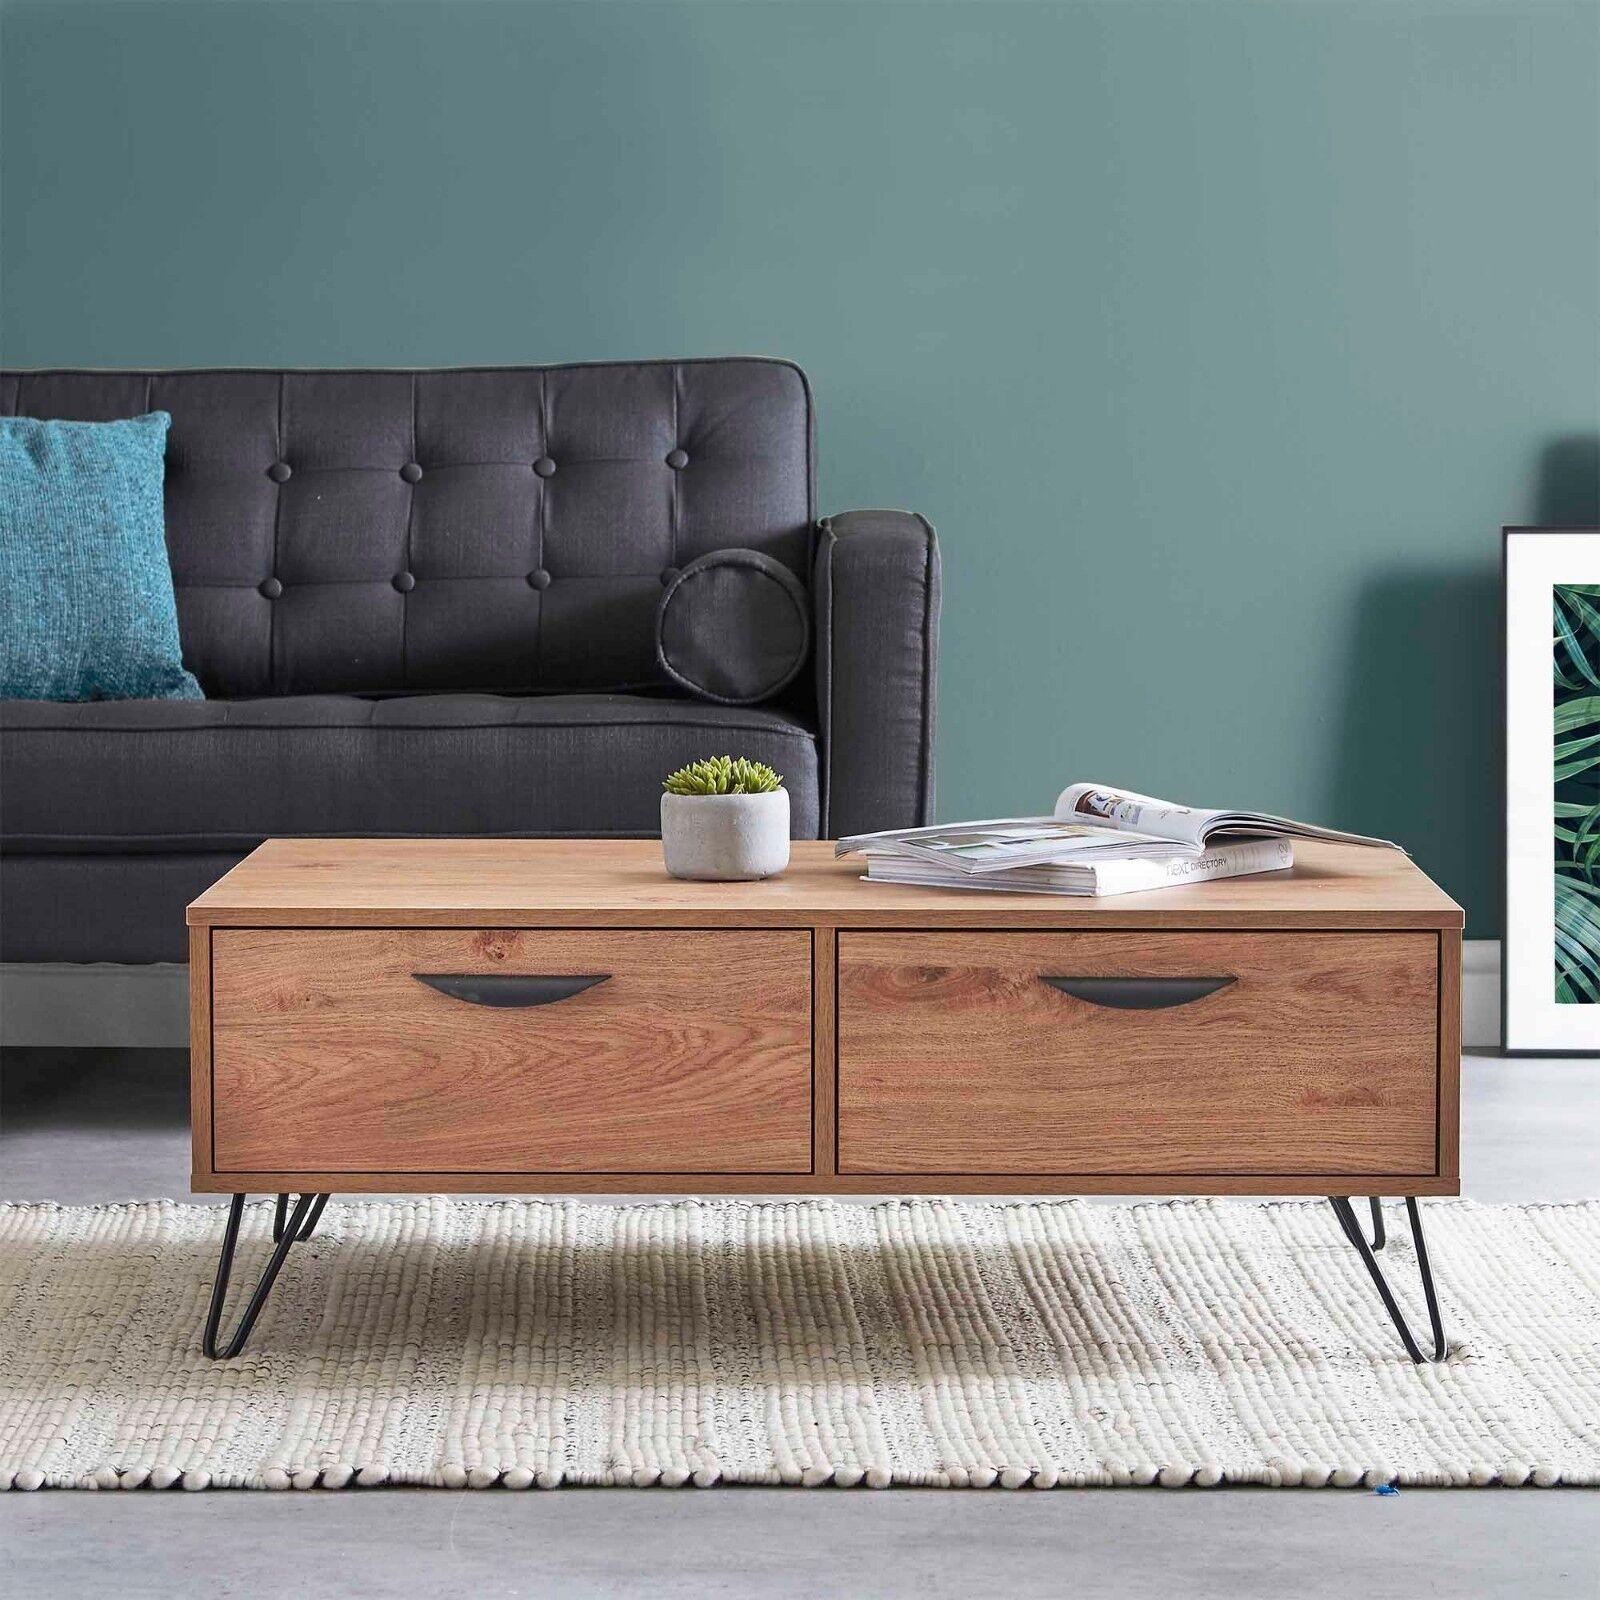 VonHaus Capri Coffee Table 2 Soft Close Drawers Oak-Effect Finish Living Room